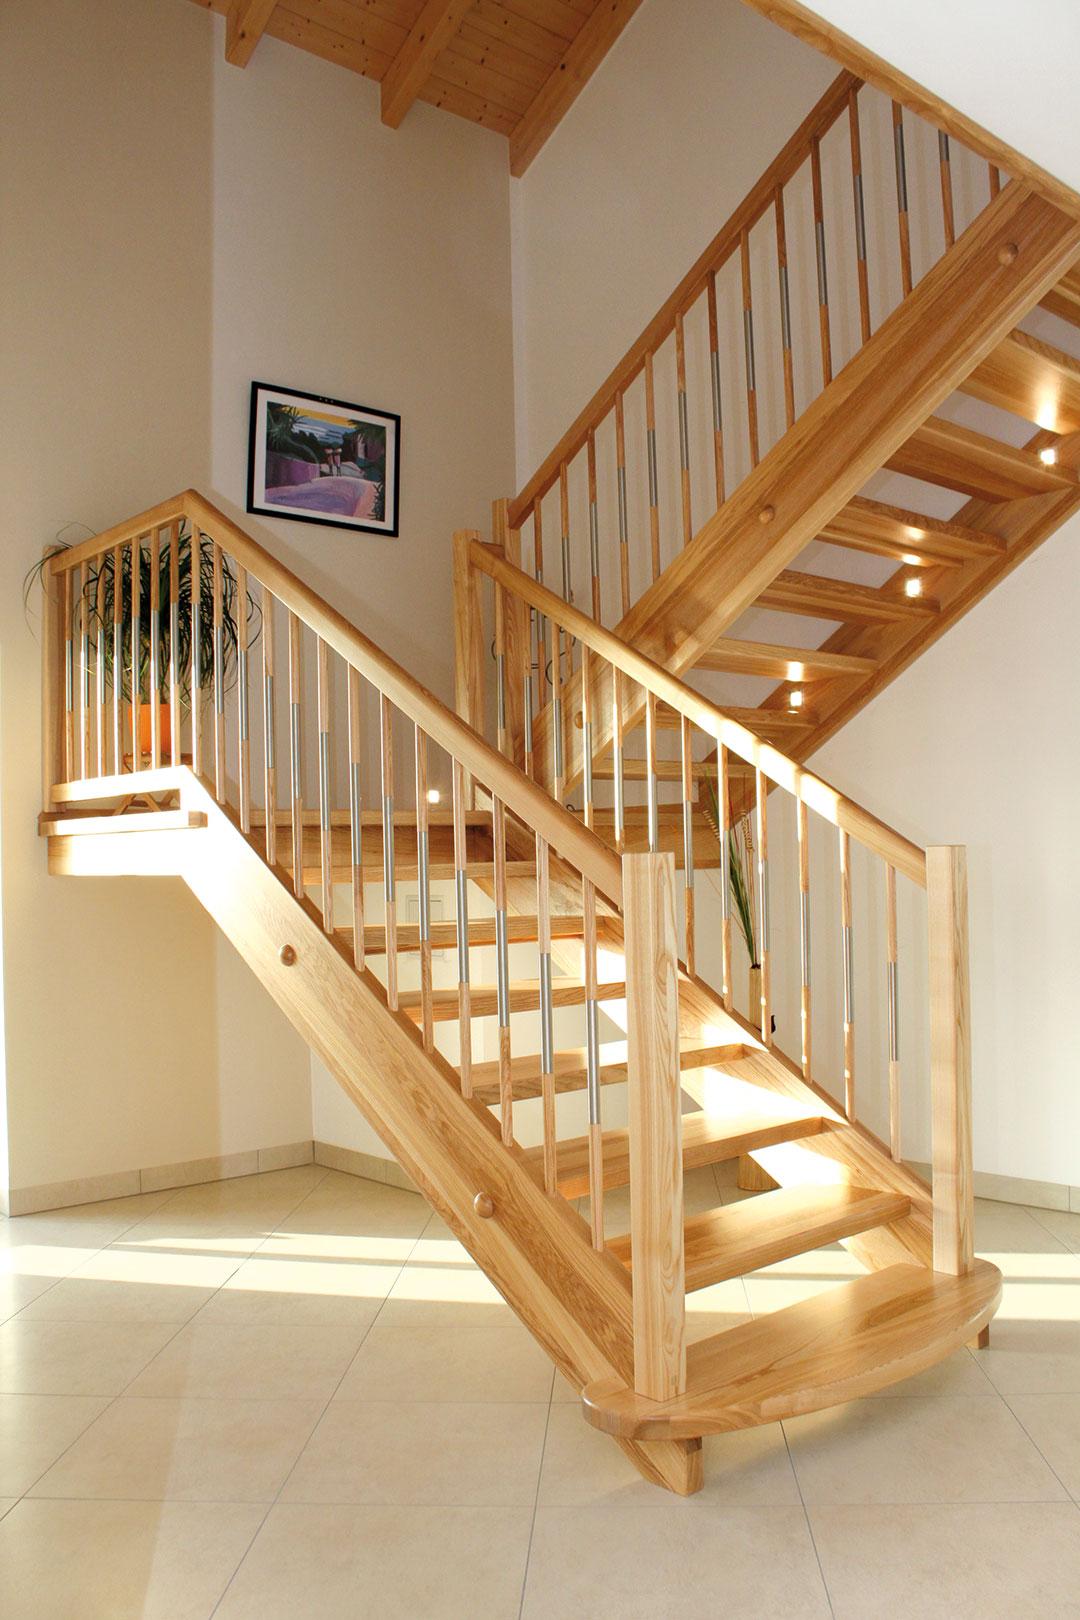 wangentreppe 3 gell franz treppen gel nderbau. Black Bedroom Furniture Sets. Home Design Ideas